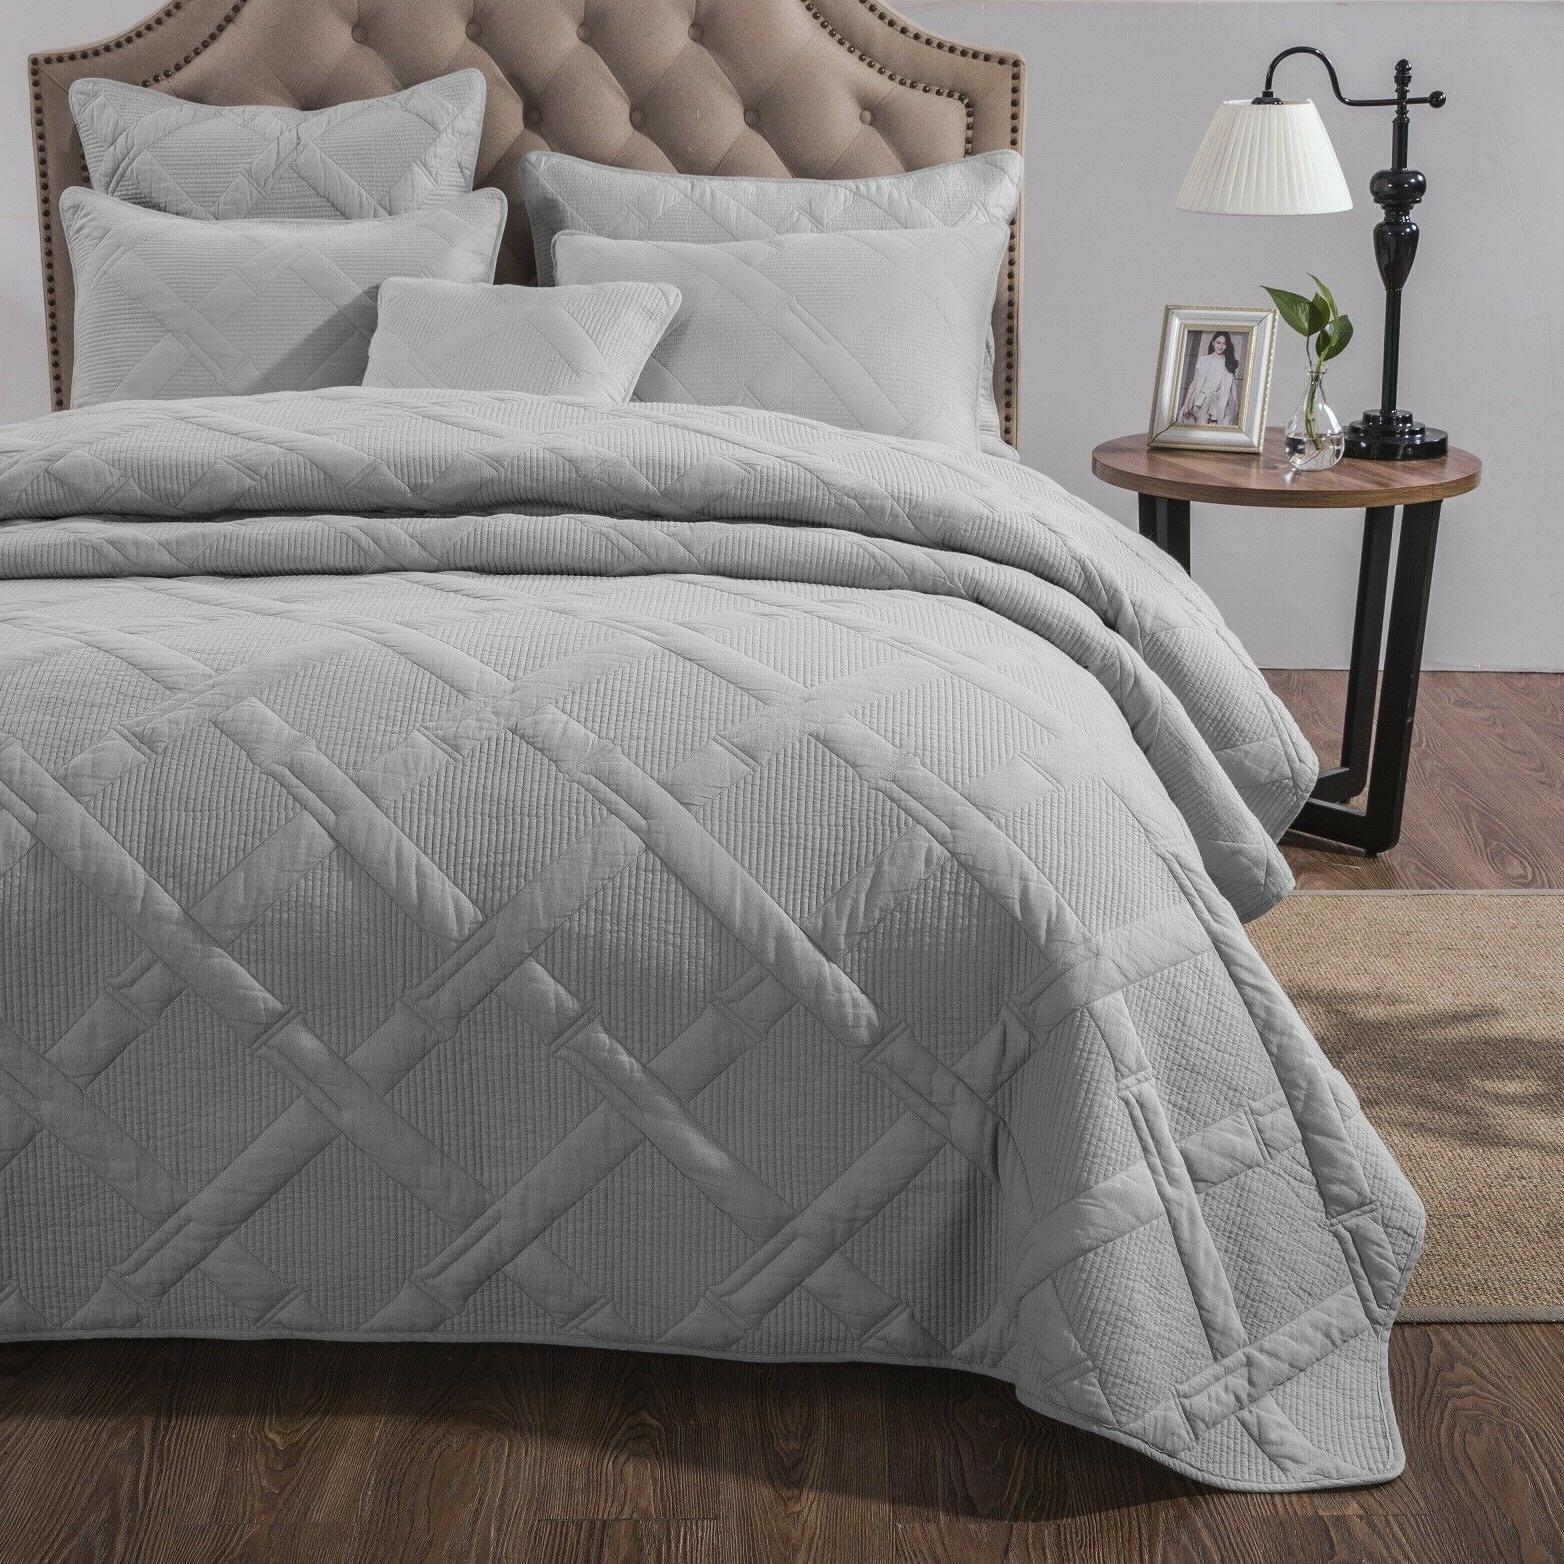 Tache Solid Silver Coverlet Bedspread Set